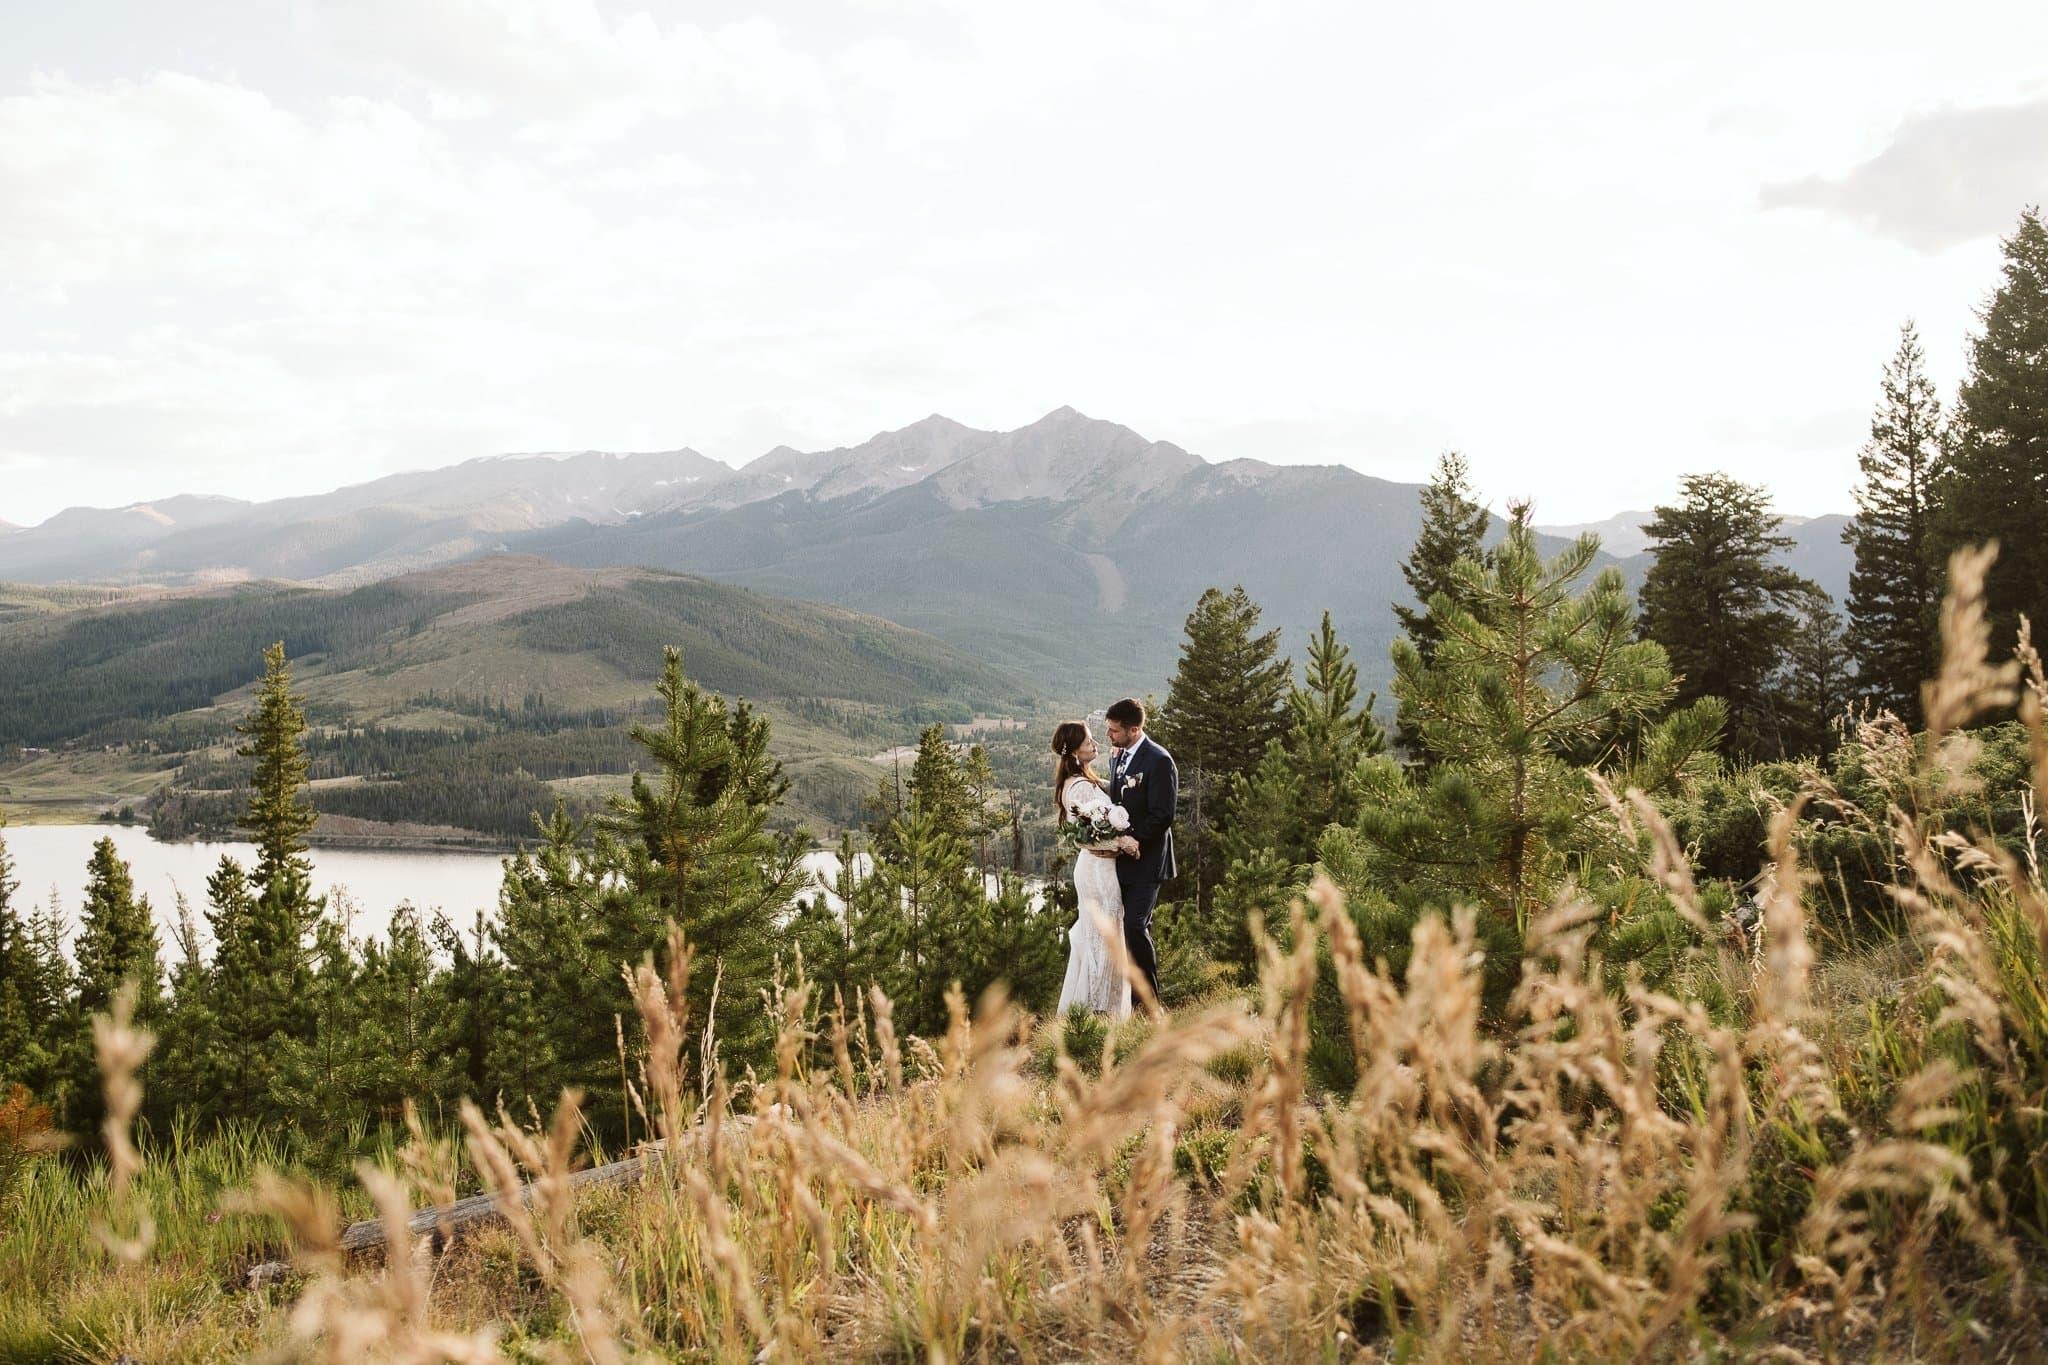 Breckenridge elopement photos with mountain views.